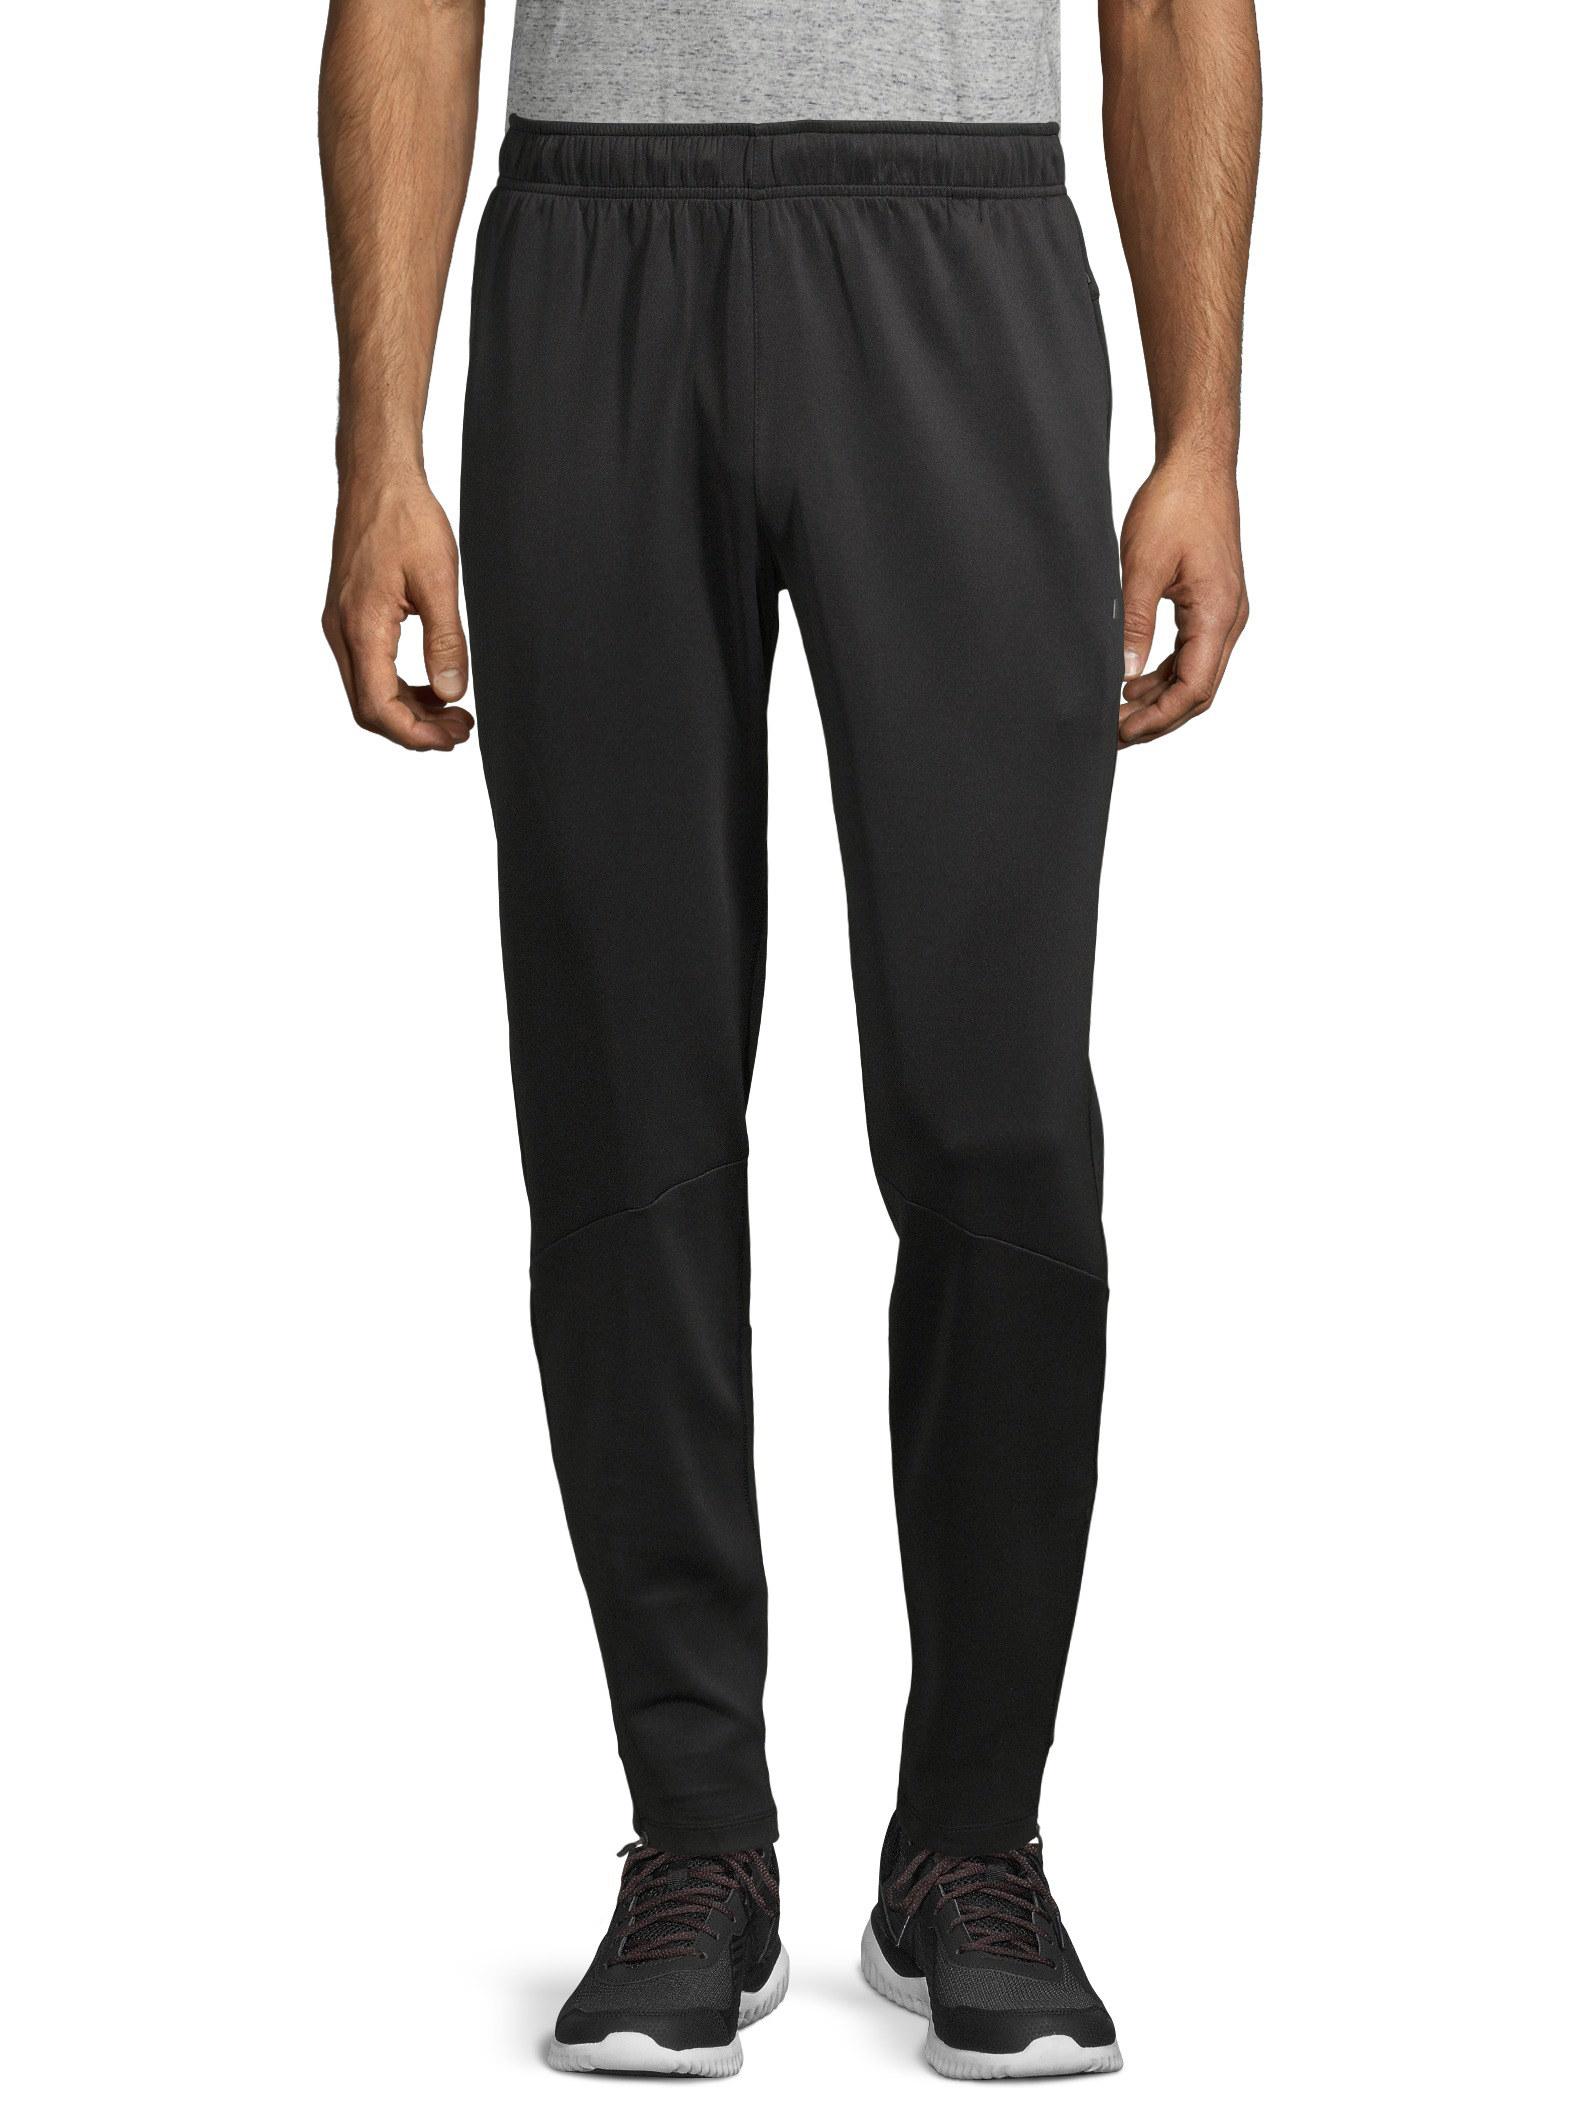 The black sweatpants